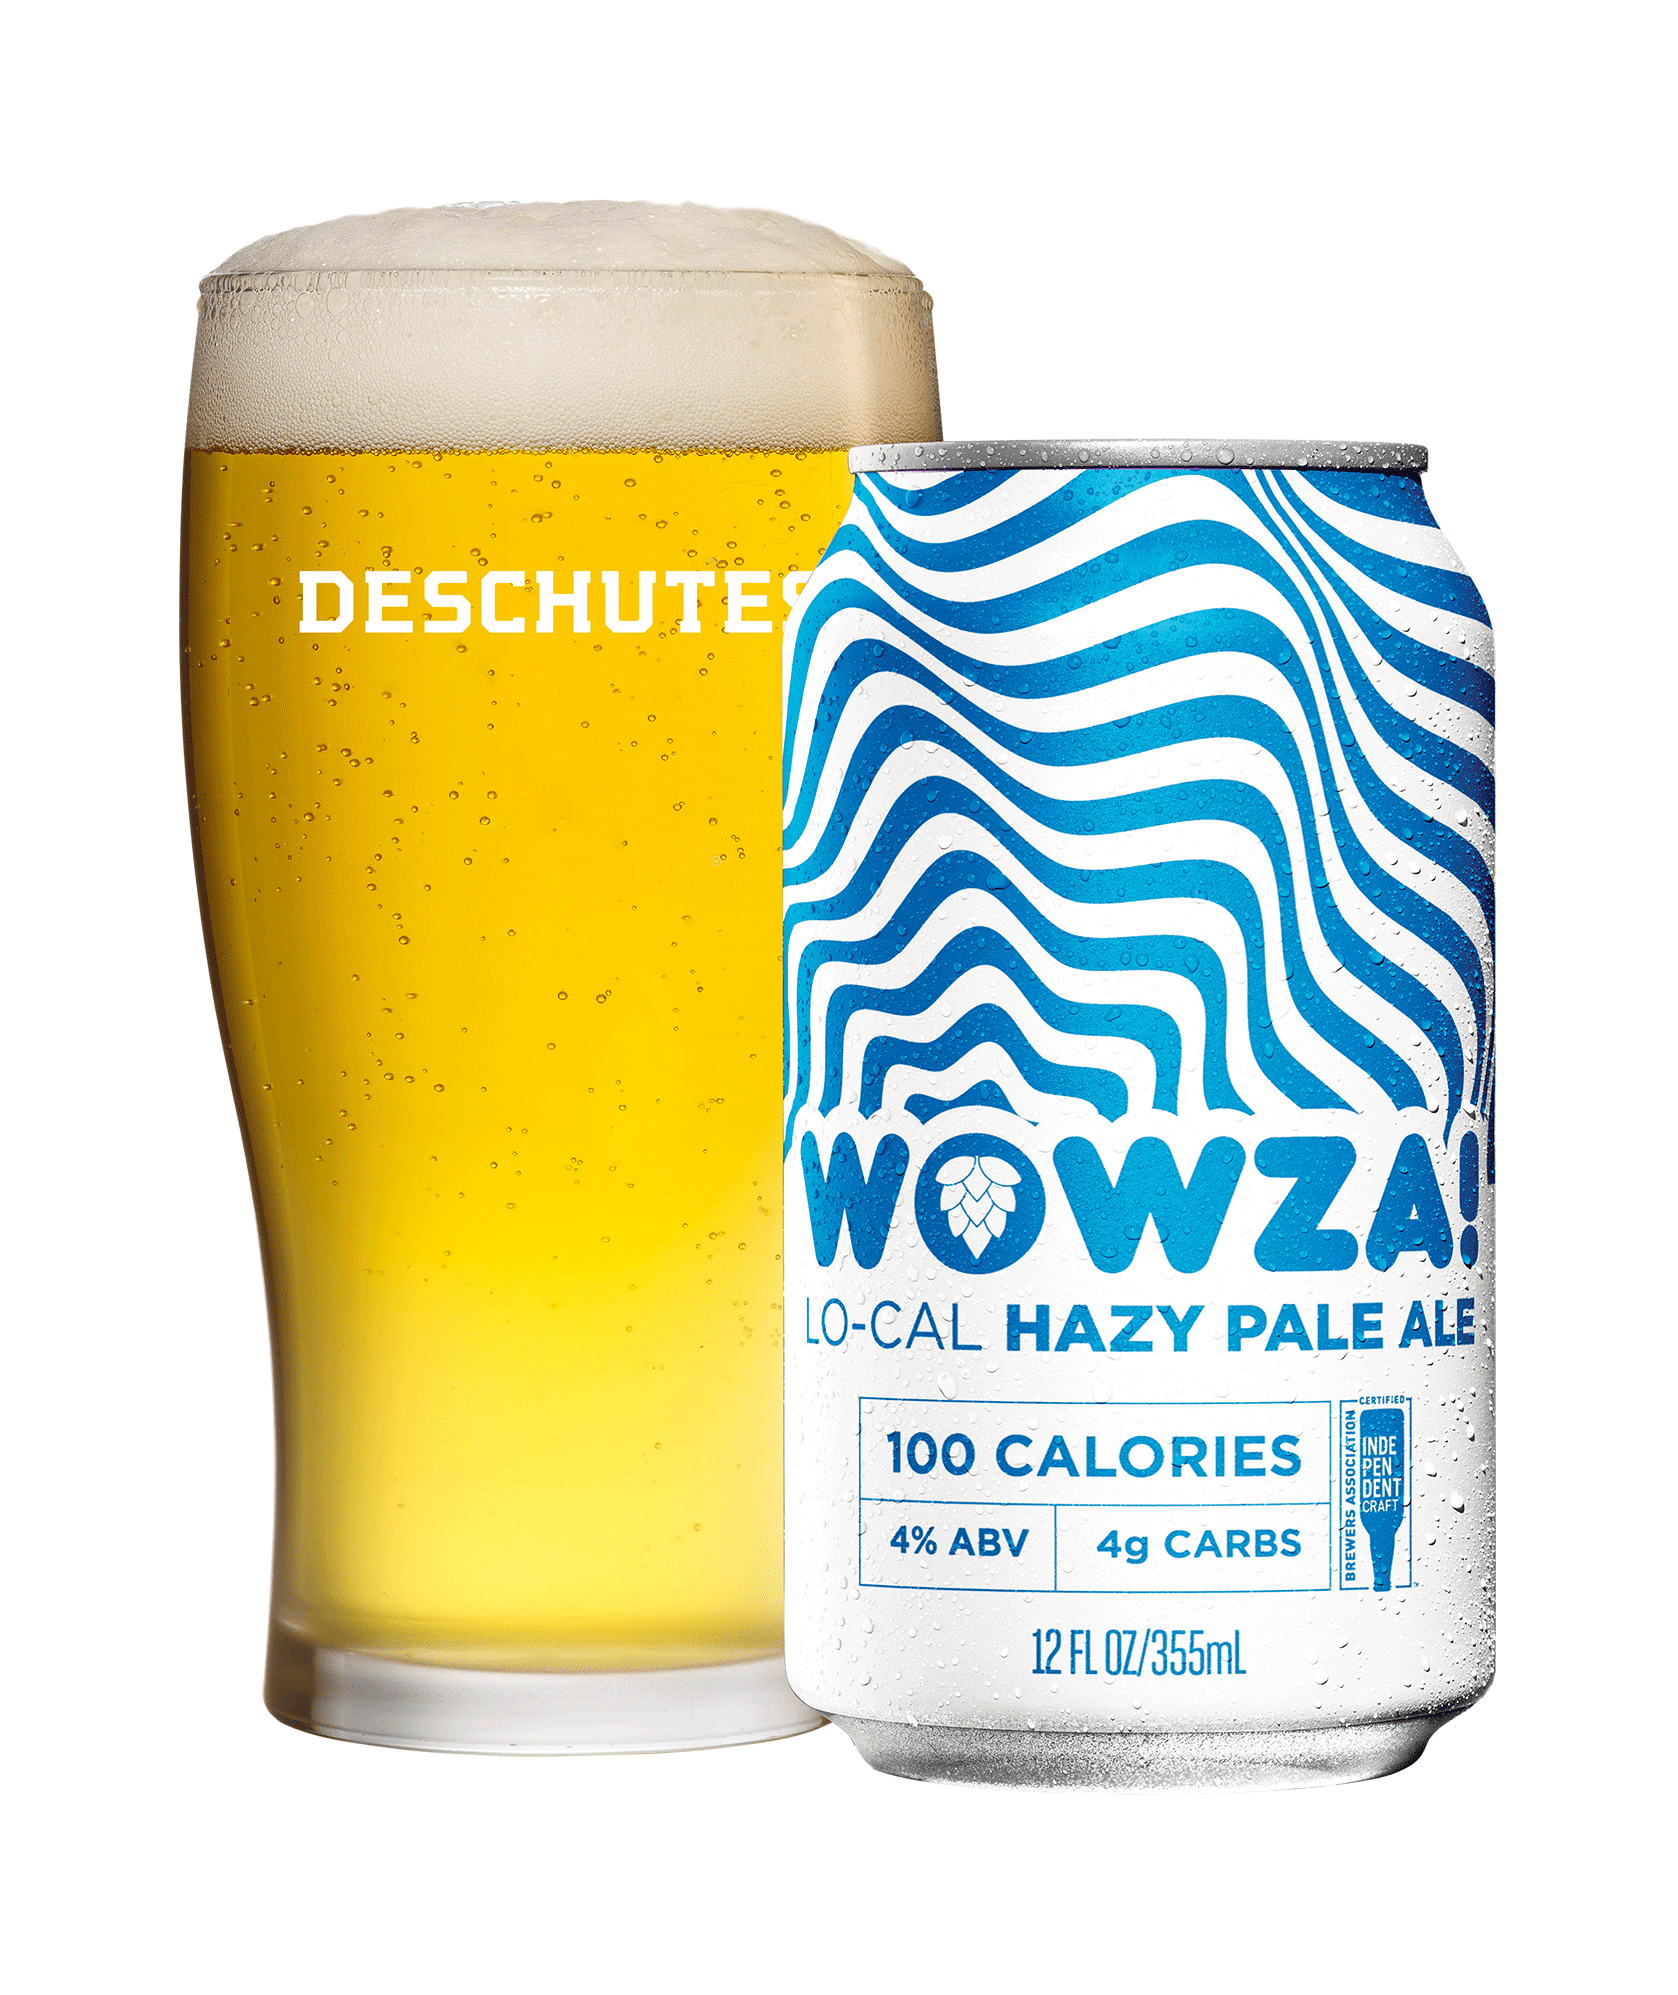 Deschutes WOWZA! Lo-Cal Hazy Pale Ale